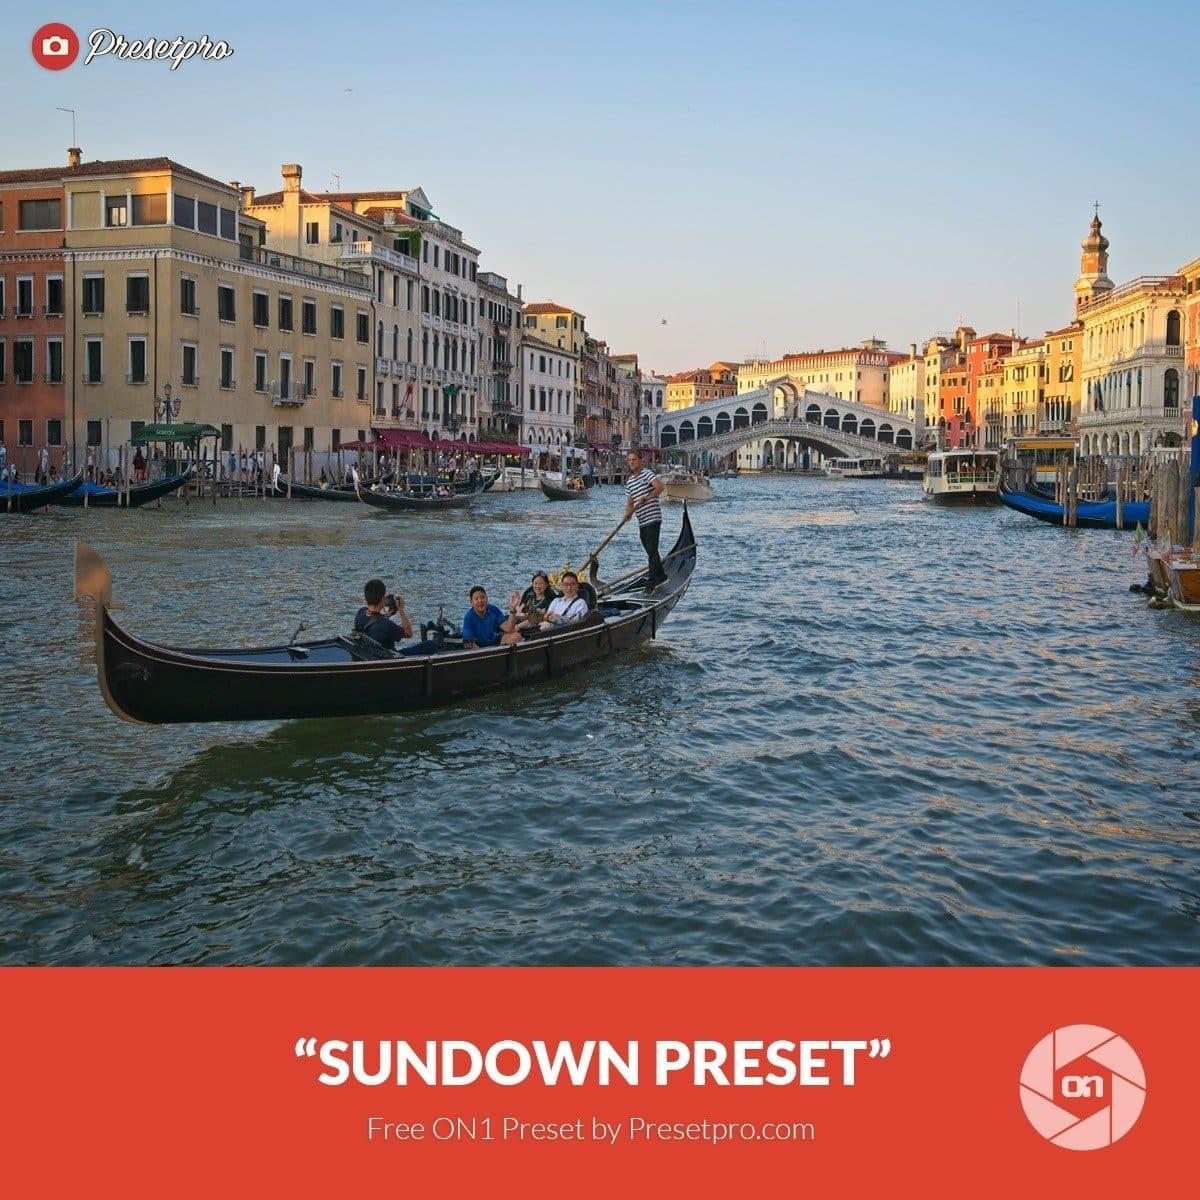 Free-On1-Preset-Sundown-Presetpro.com